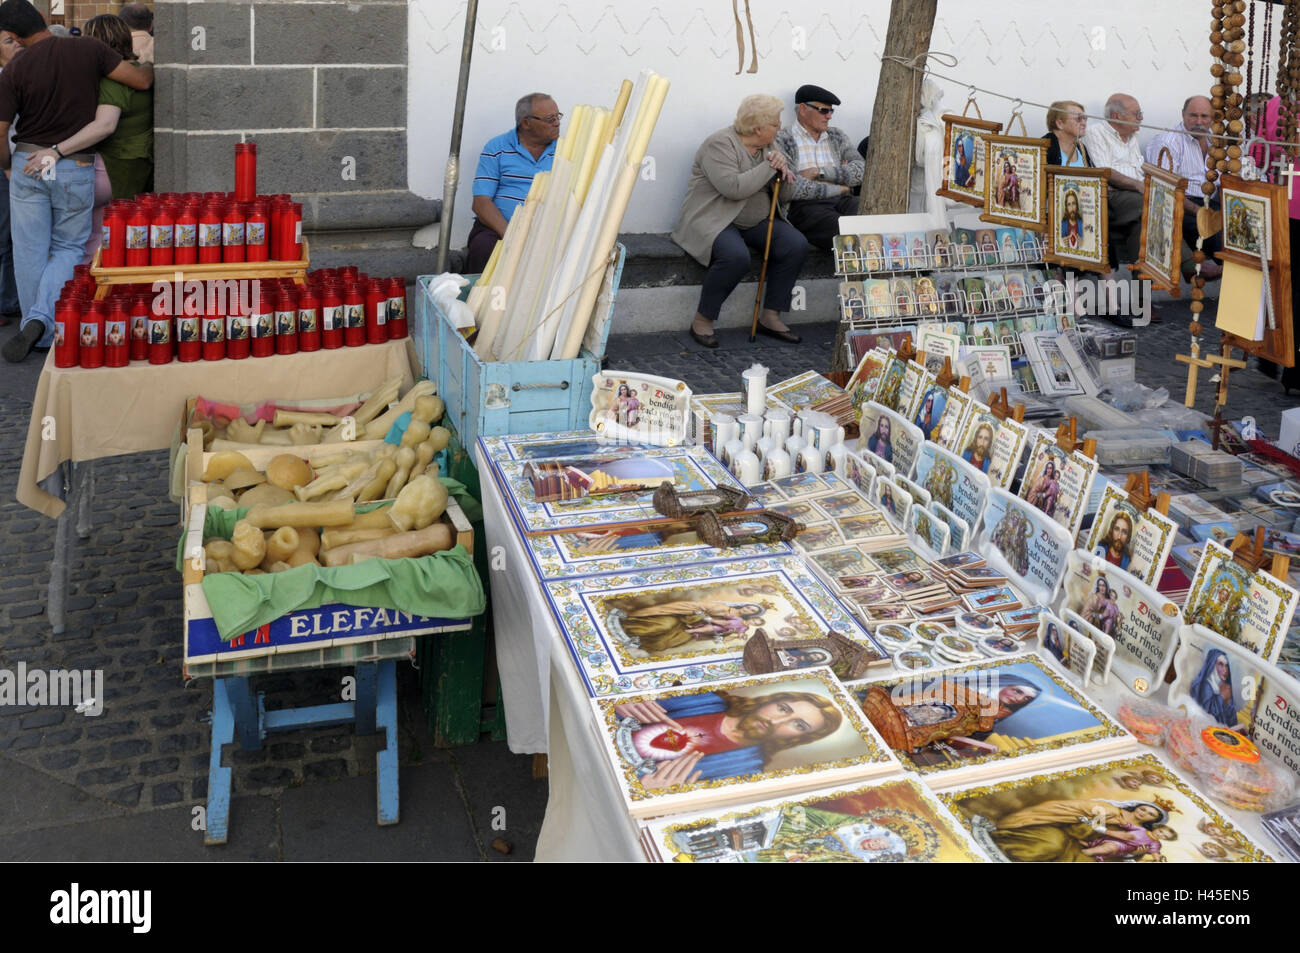 Spain, Canary islands, island grain Canaria, Teror, pawn market, market stall, sales, devotional objects, senior - Stock Image